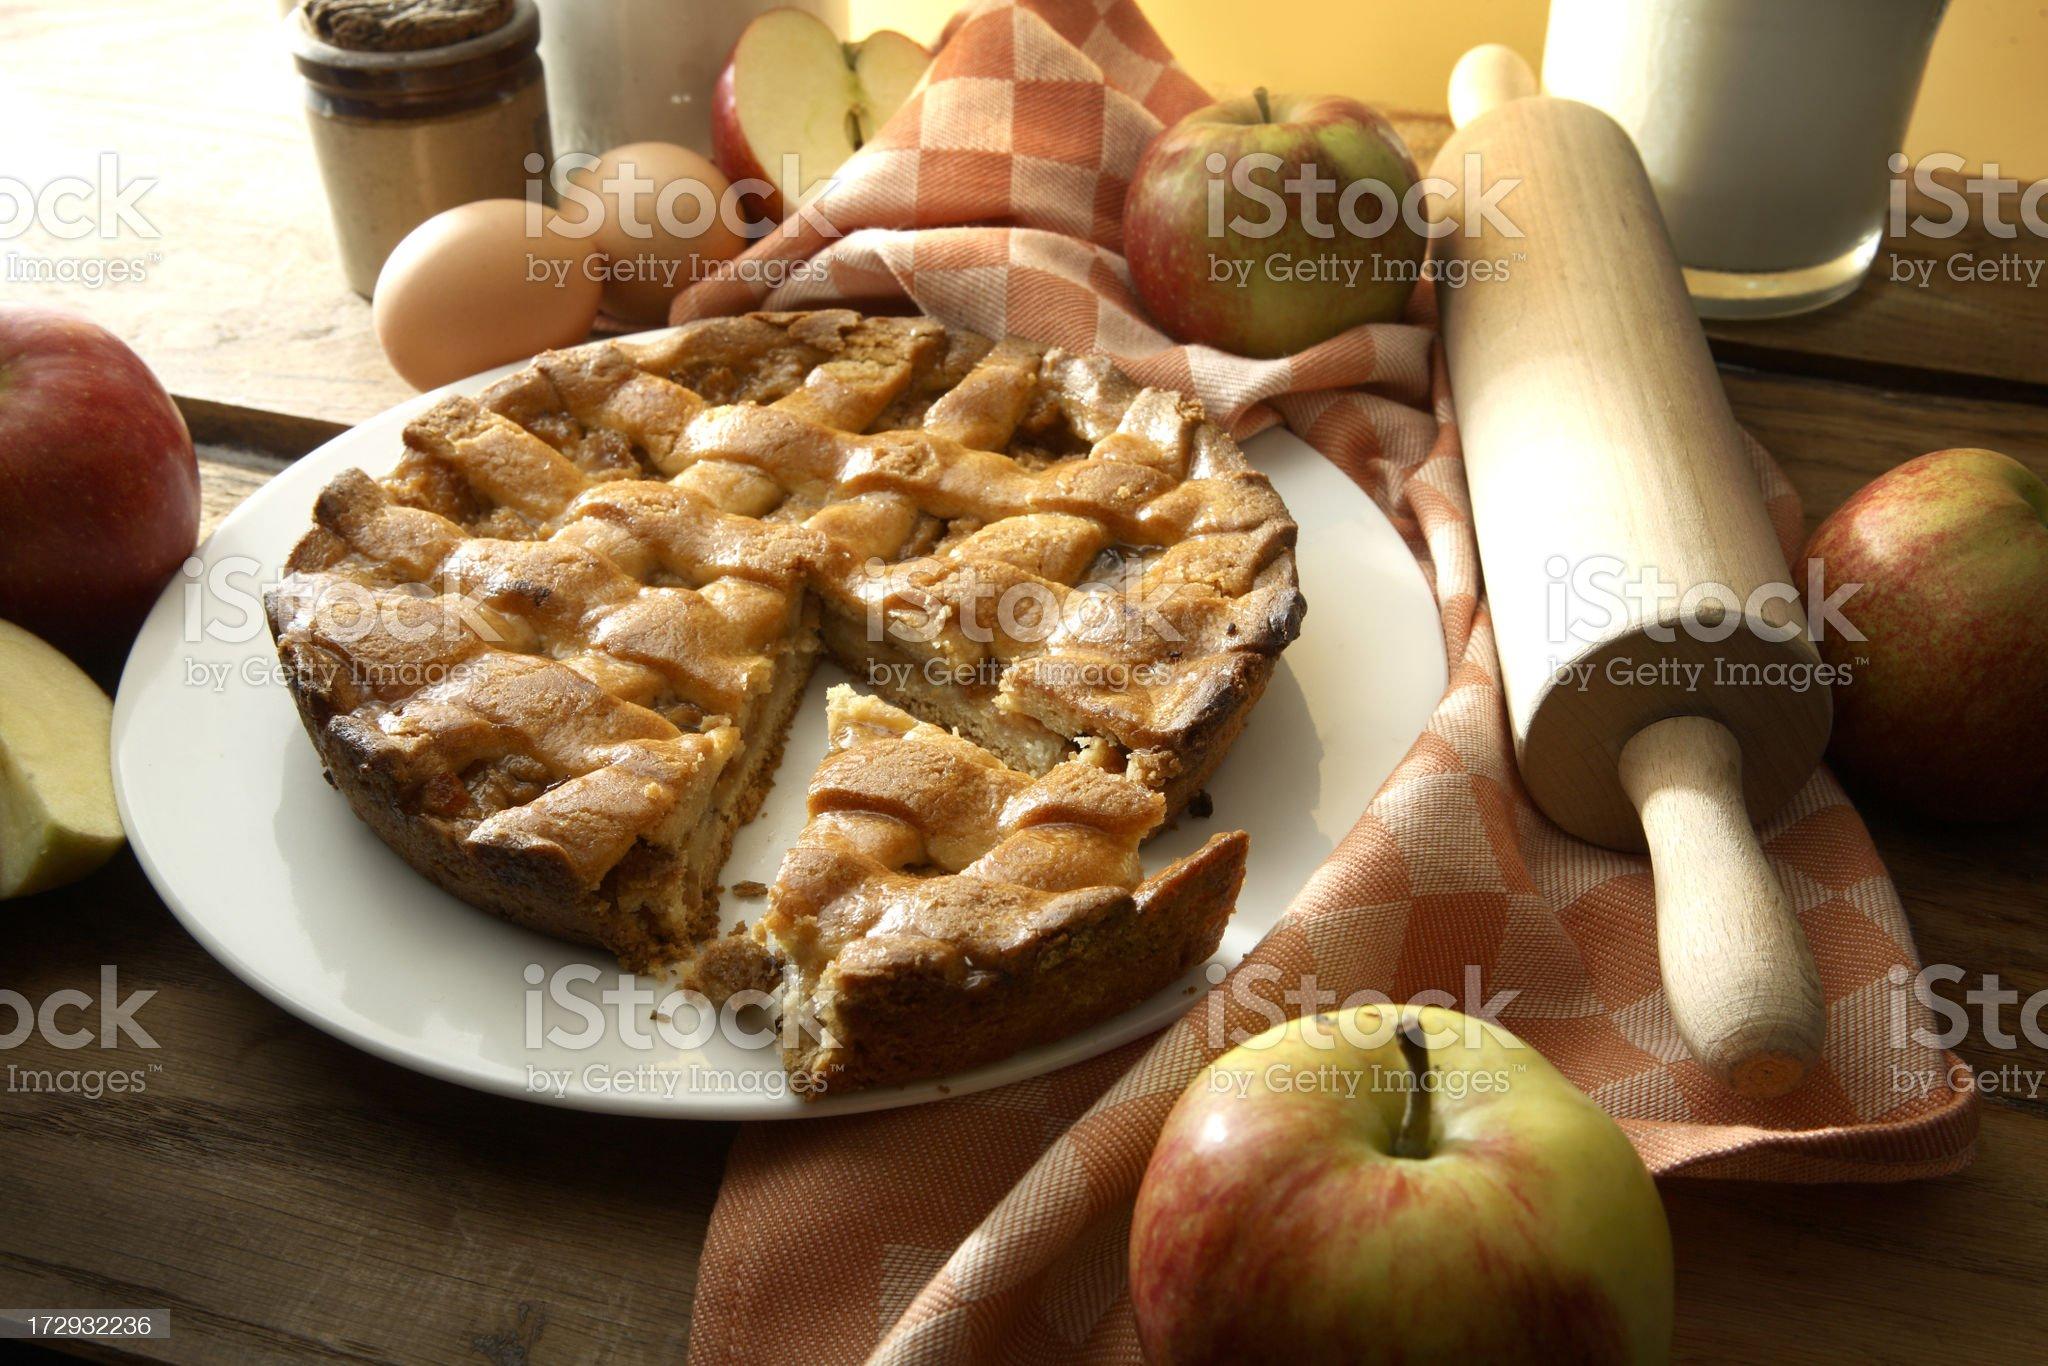 Baking Stills: Apple Pie royalty-free stock photo